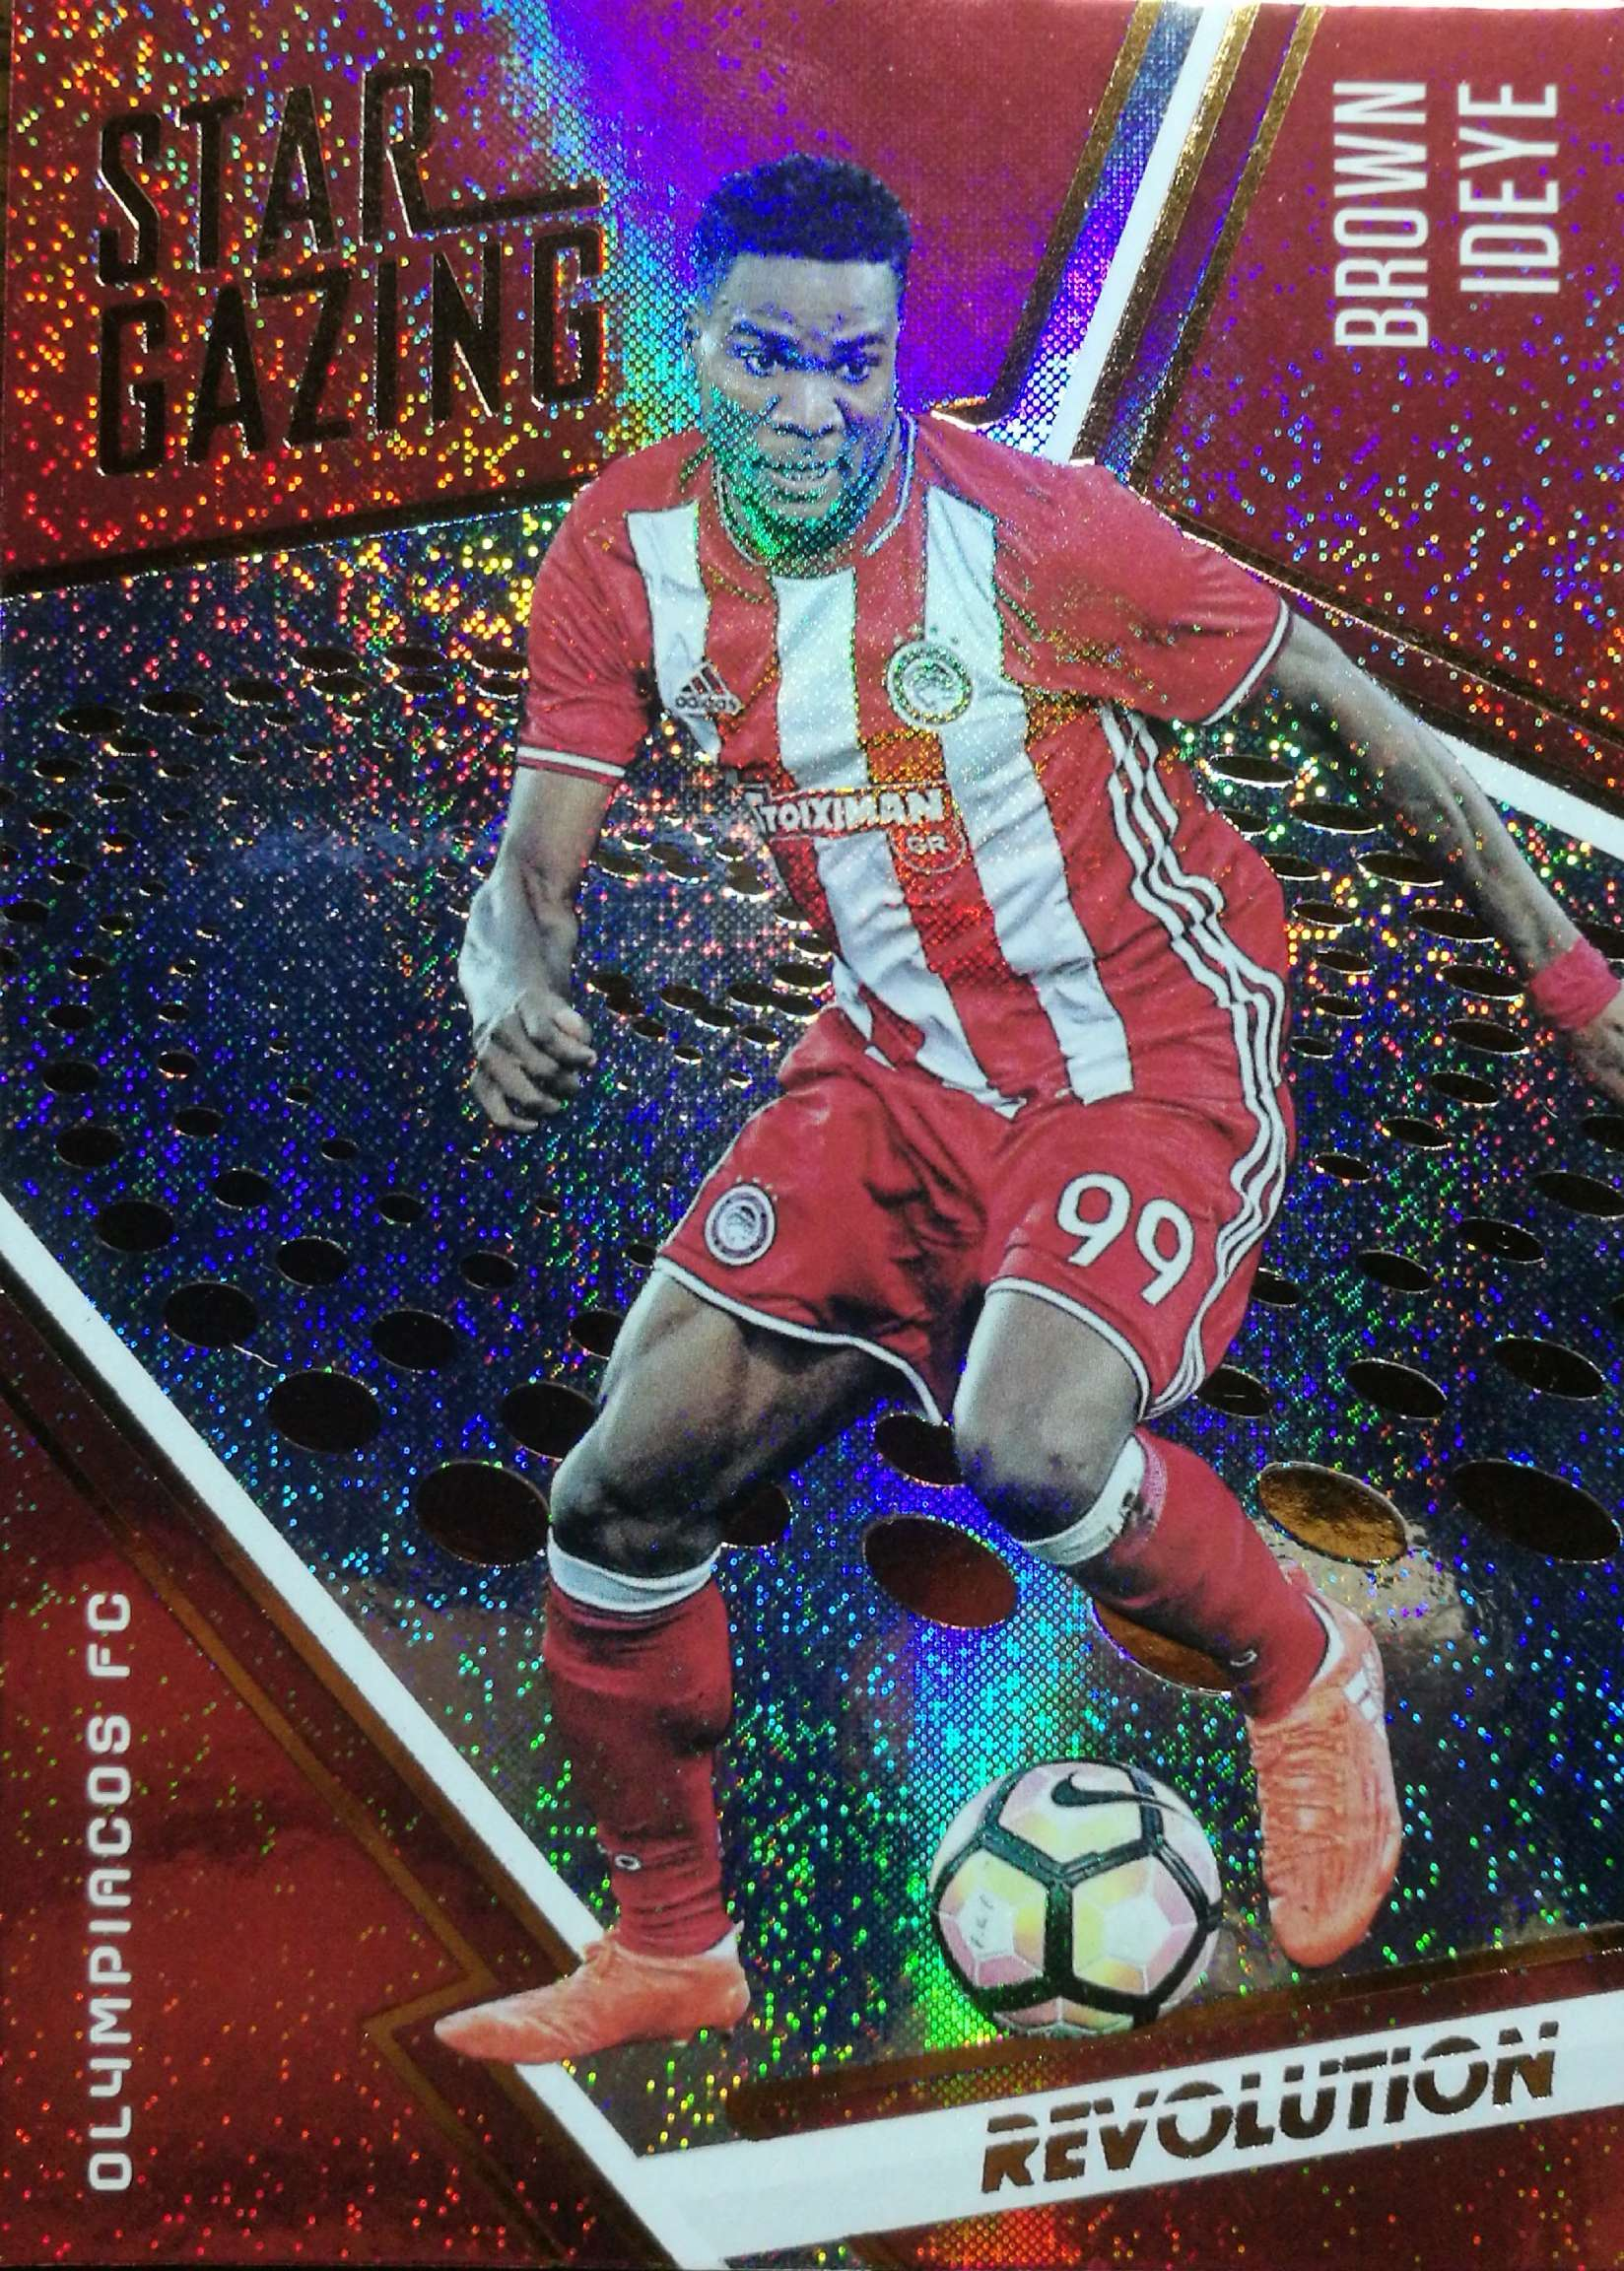 【Ed】 2017 Panini 革命足球球星卡 布朗·伊德耶 Brown Ideye 奥林匹亚科斯 NO.4 观星特卡